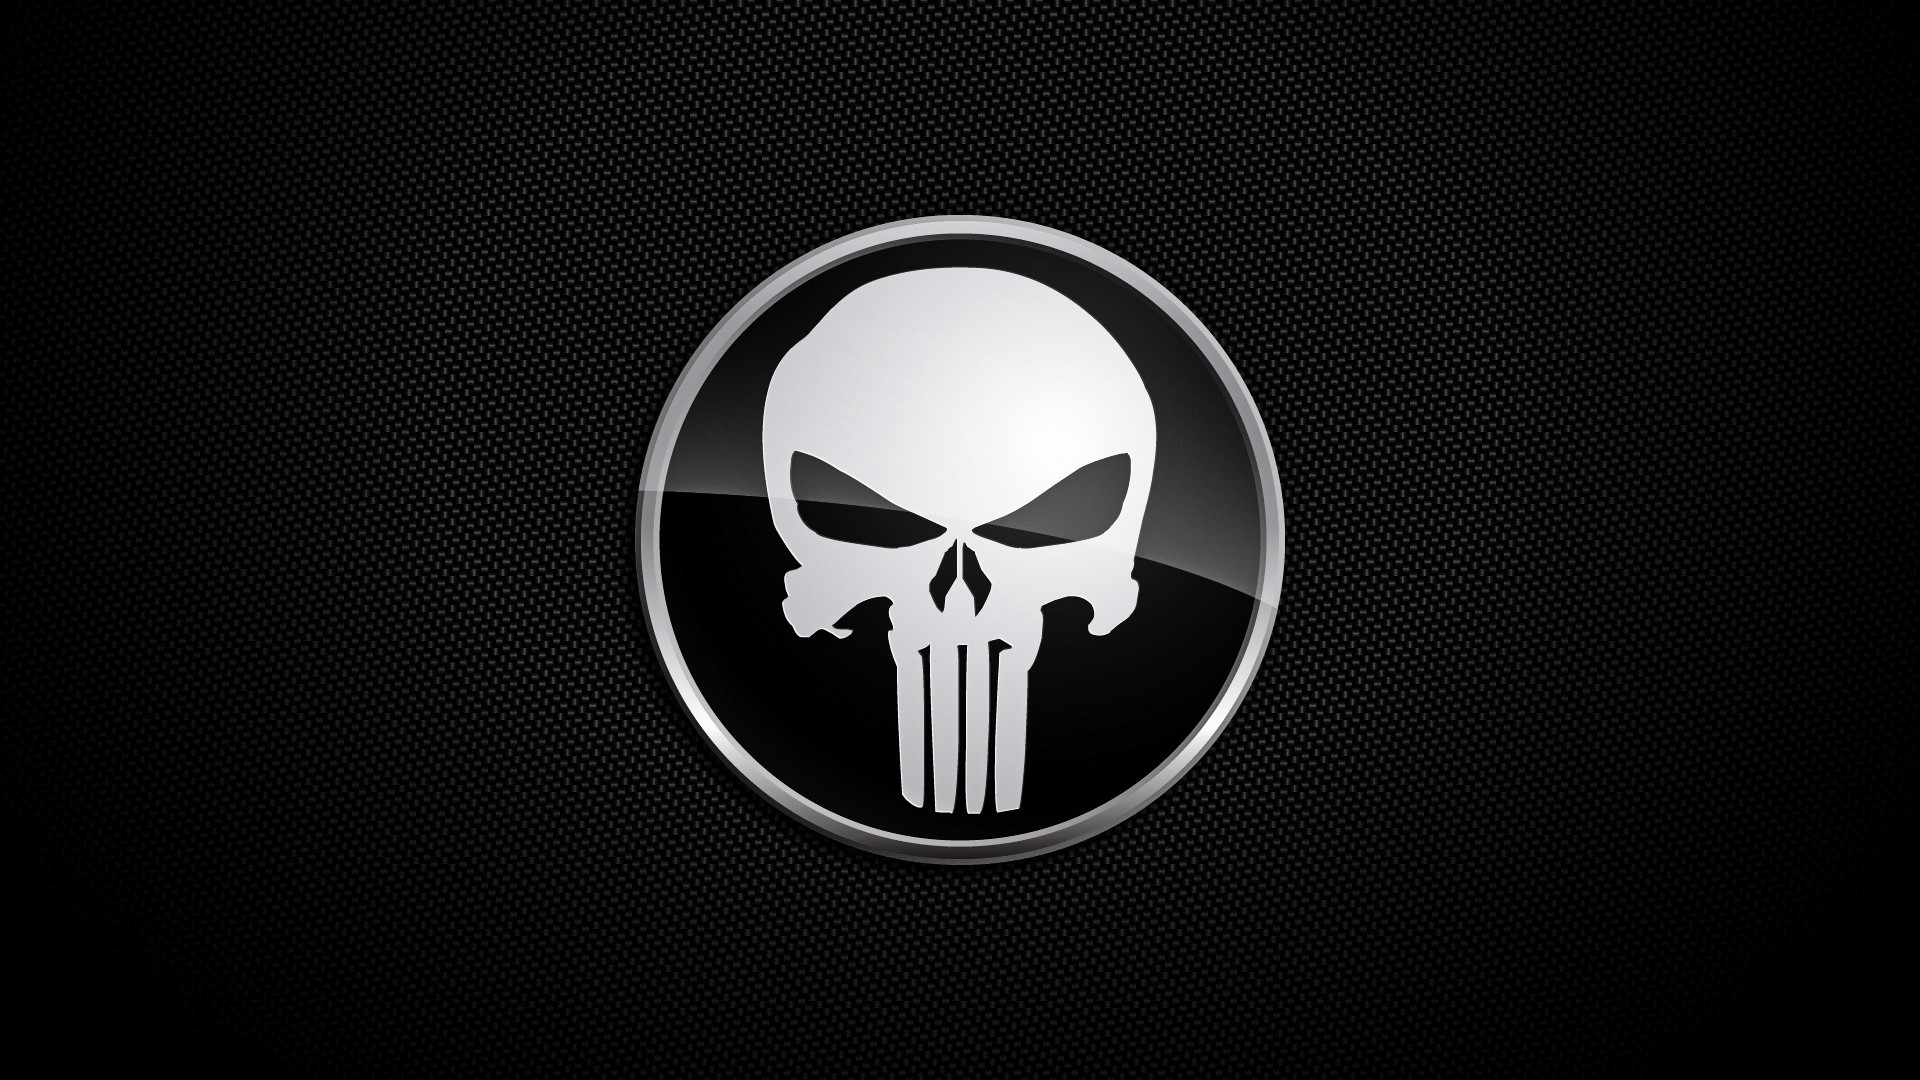 2560x1600 25 Unique Skull Wallpaper Ideas On Pinterest